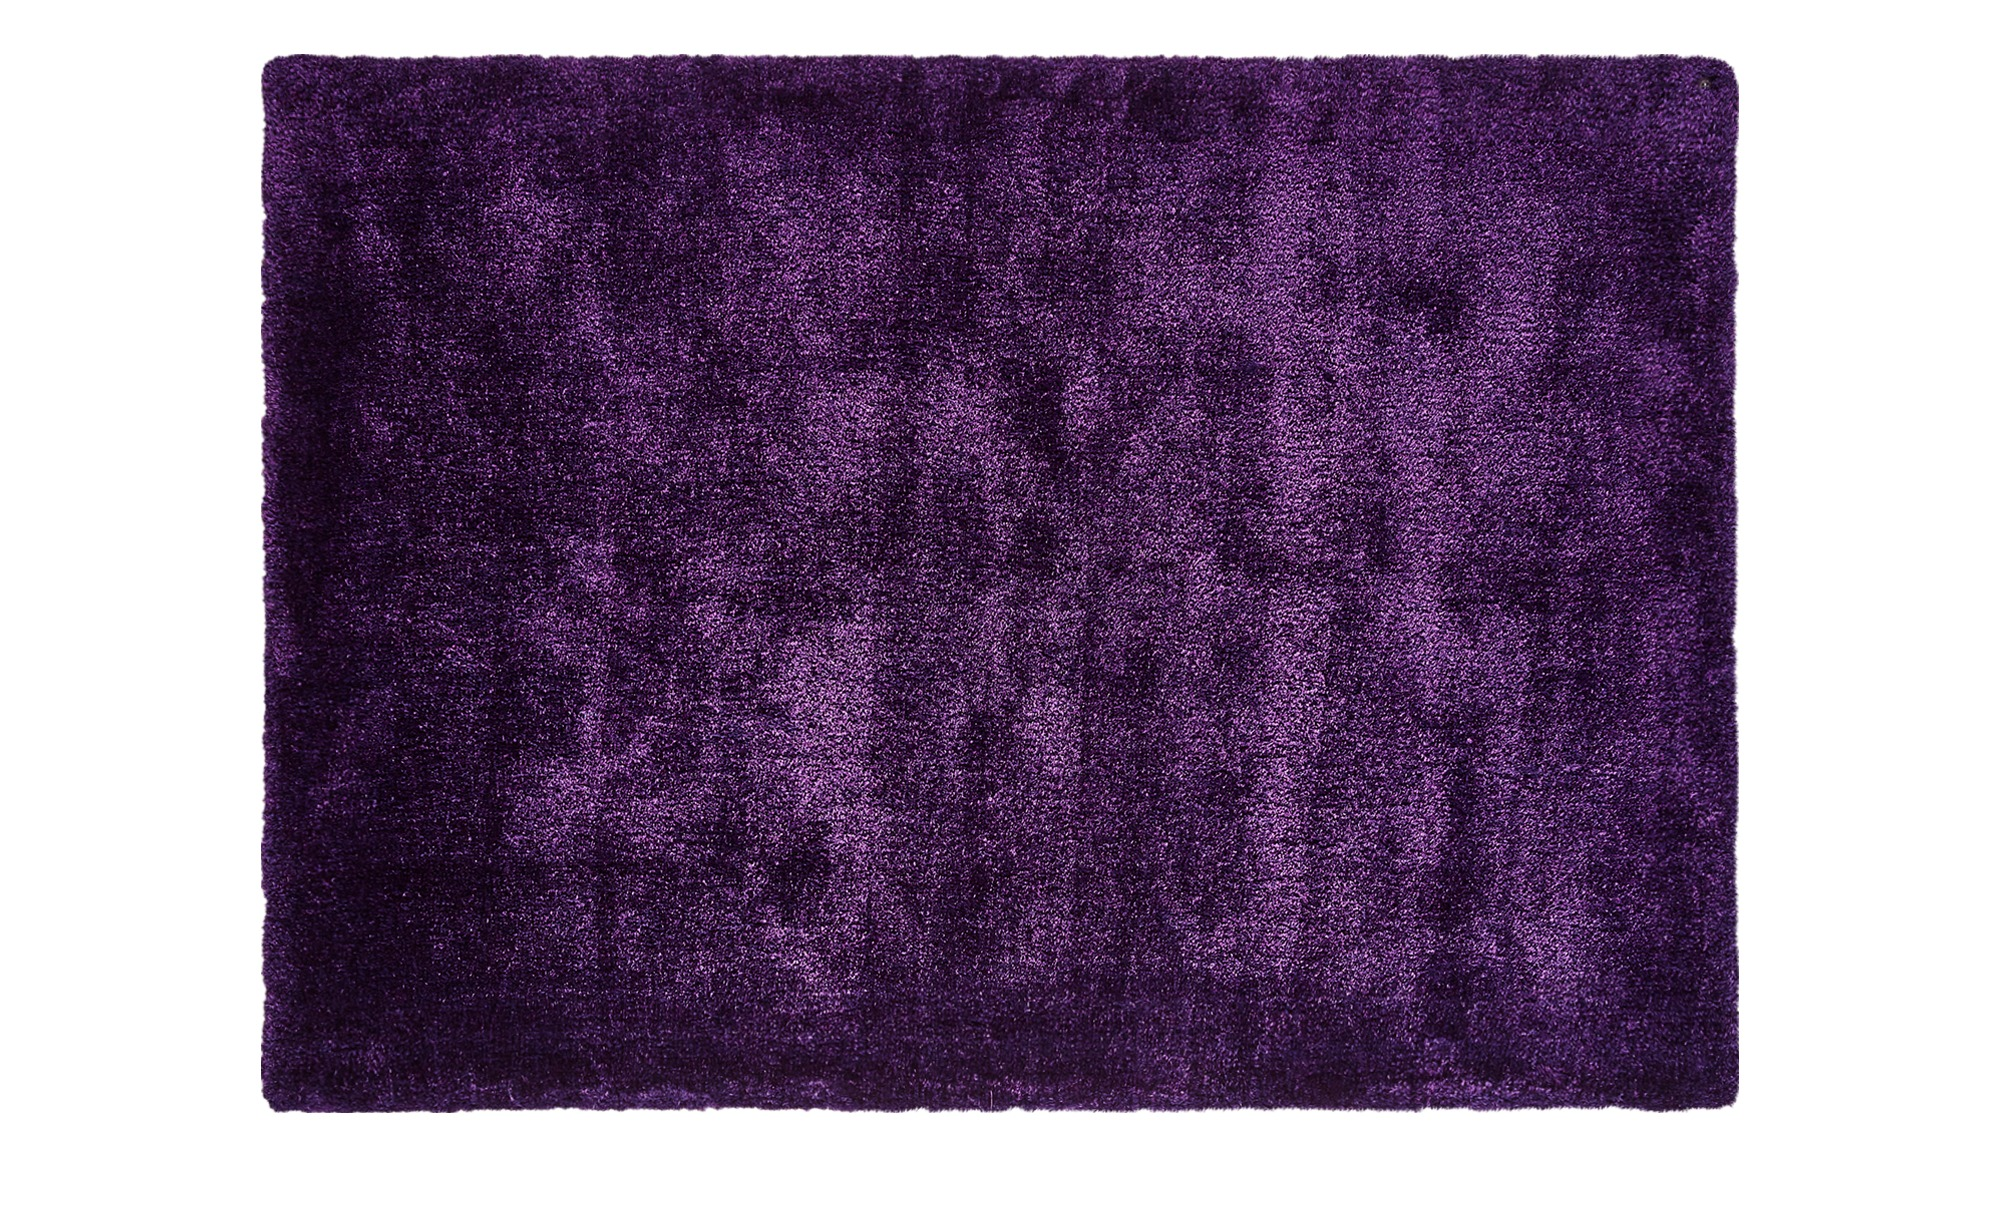 Tom Tailor Hochflor-Teppich  Soft uni ¦ lila/violett ¦ 100 % Polypropylen, Synthethische Fasern ¦ Maße (cm): B: 160 Teppiche > Wohnteppiche > Hochflorteppiche - Höffner